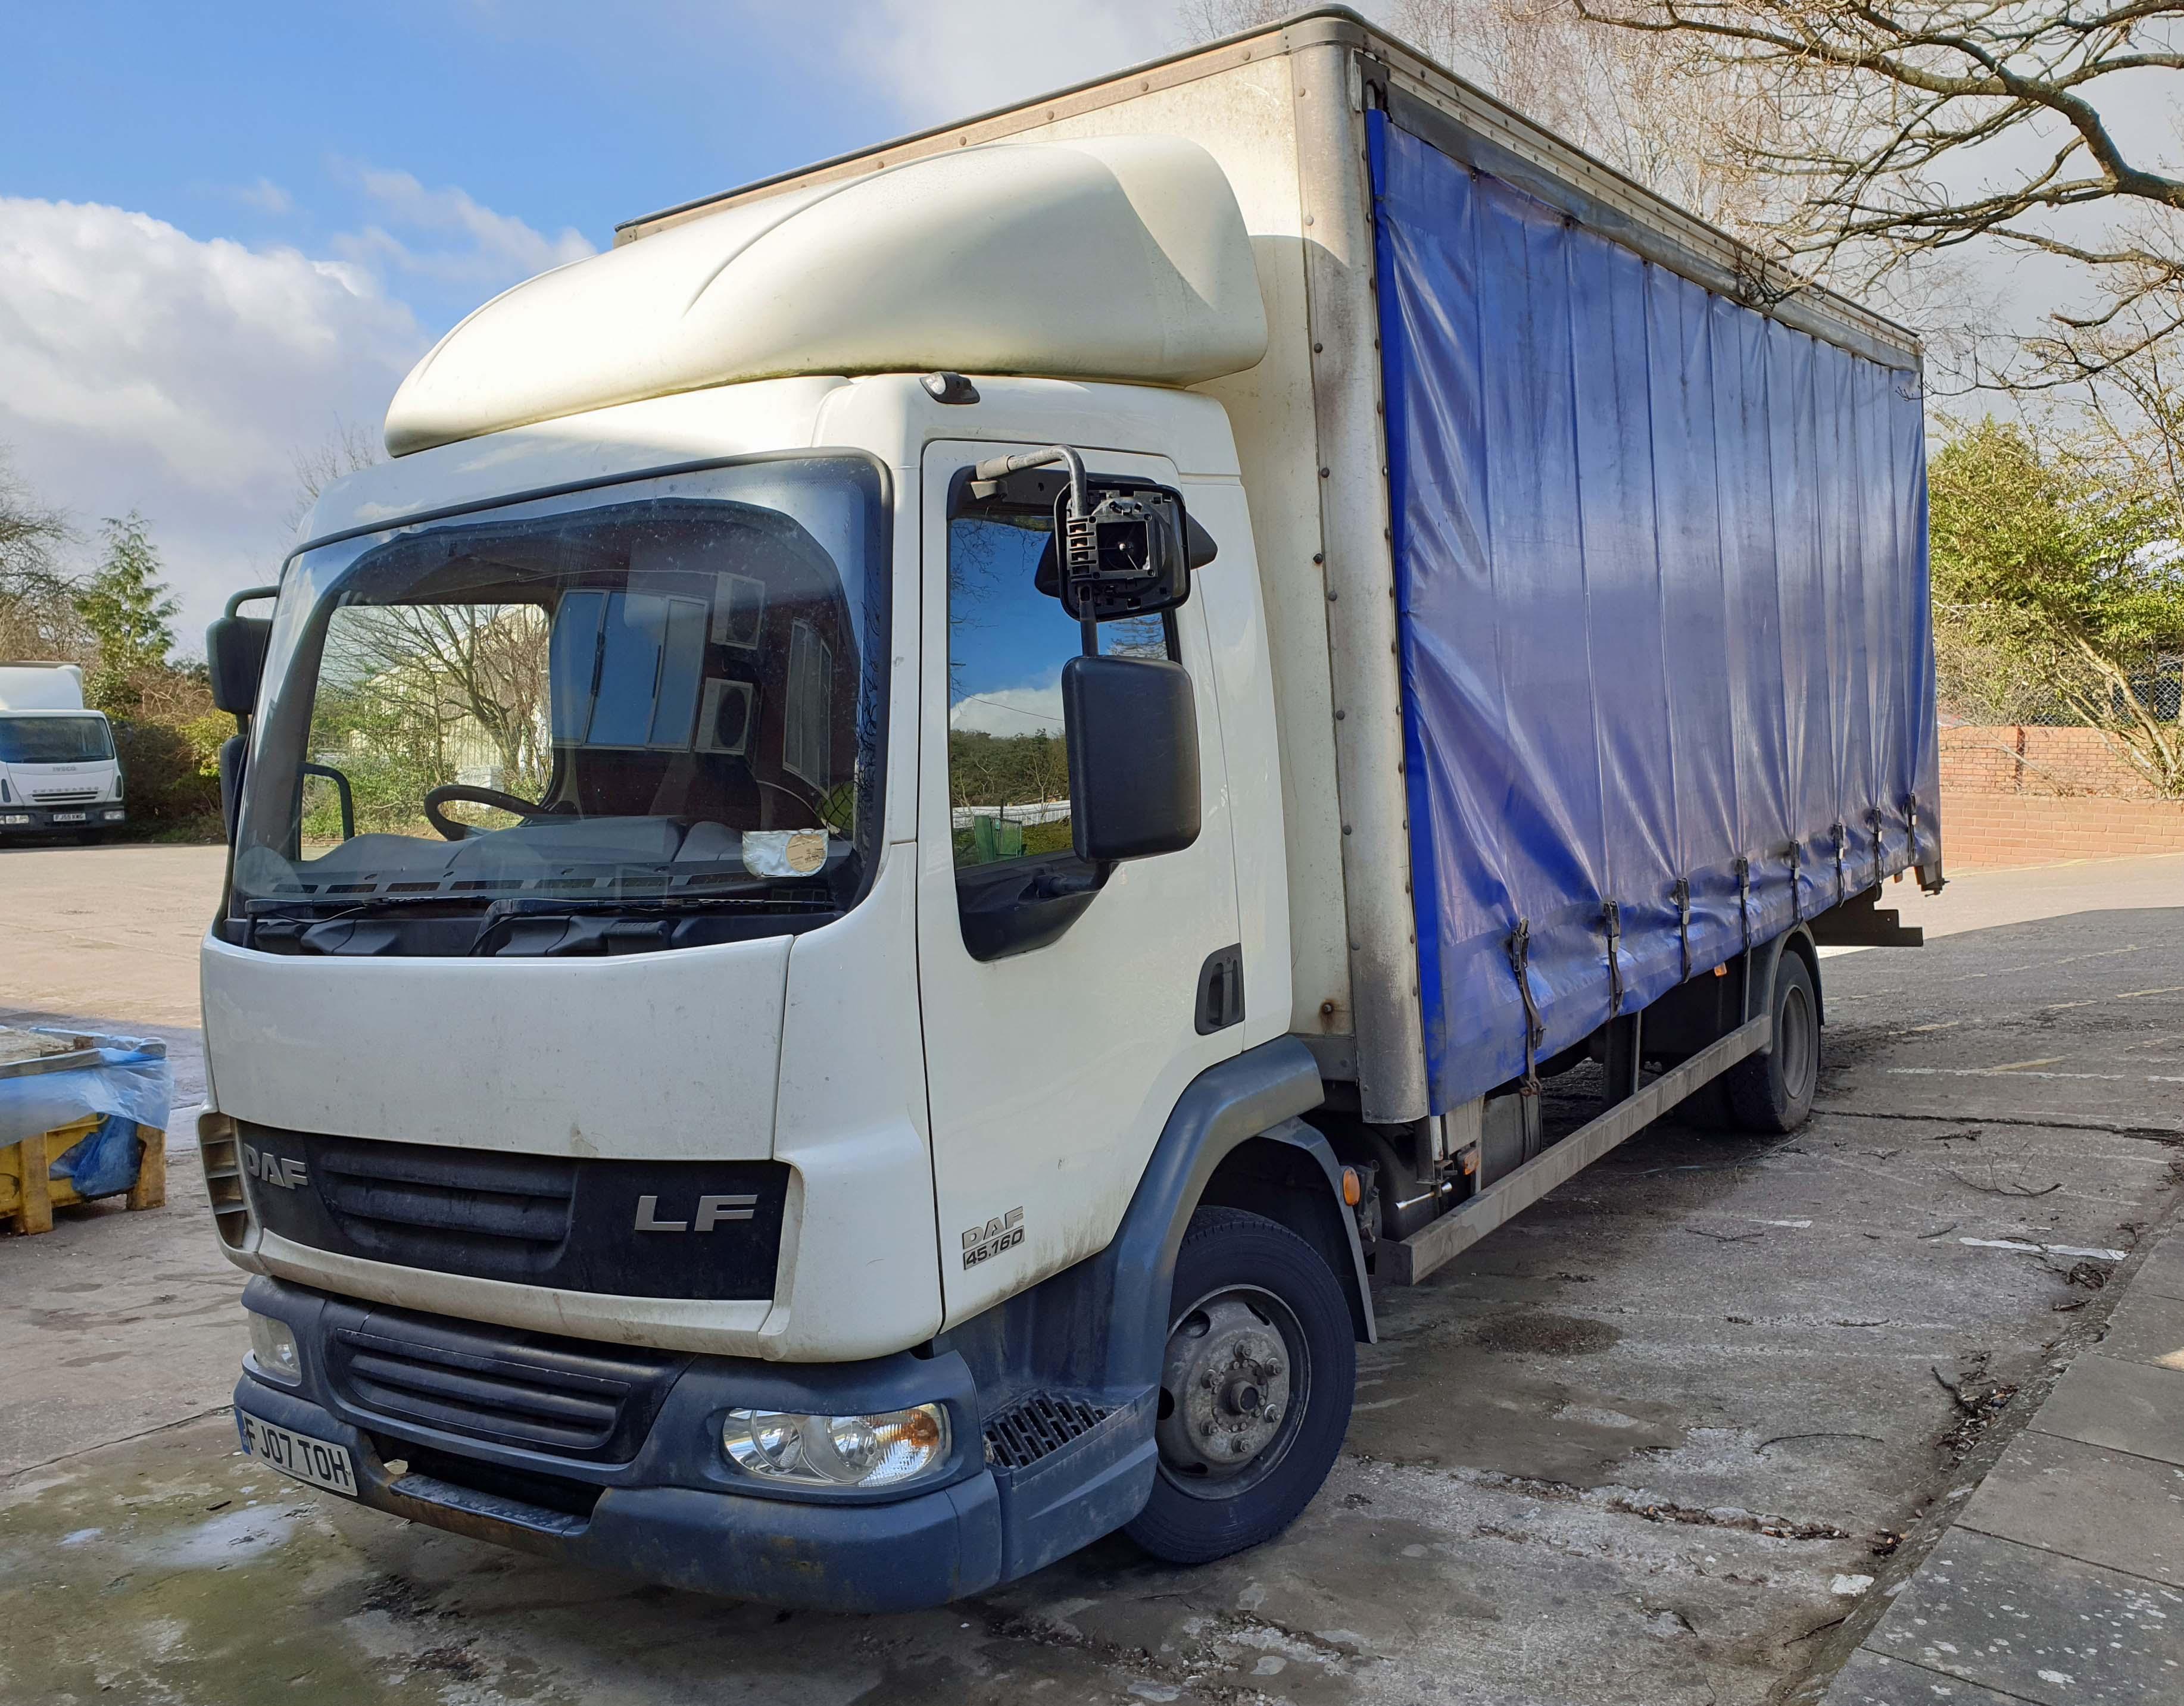 A DAF FA LF45.160 08 E 4500cc 4x2 7.5-Tonne Curtainside Truck, Registration No. FJ07 TOH, First